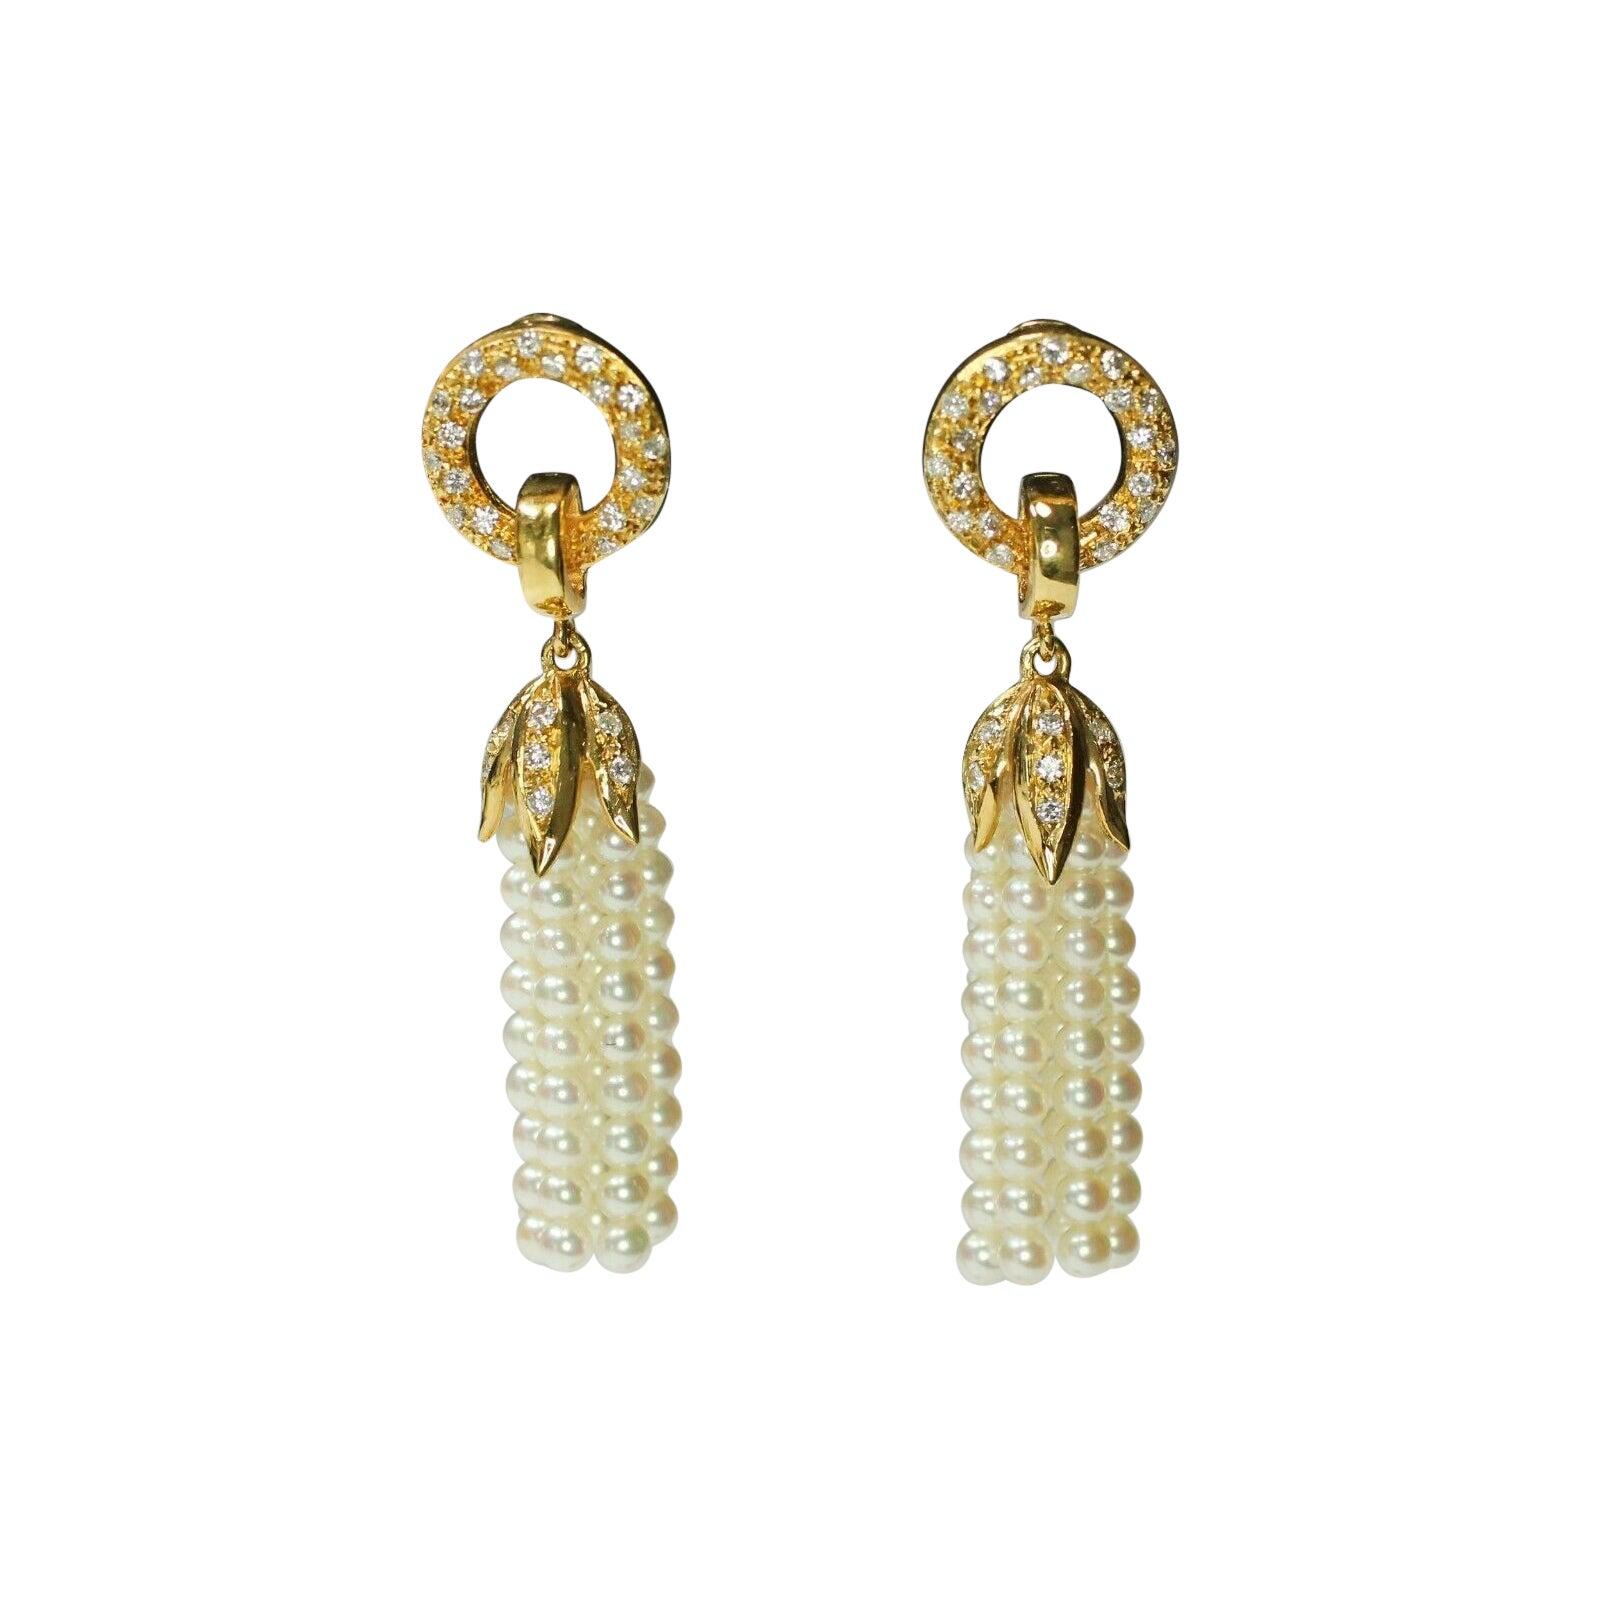 18k Yellow Gold Pearl Tassel Earrings with Diamonds